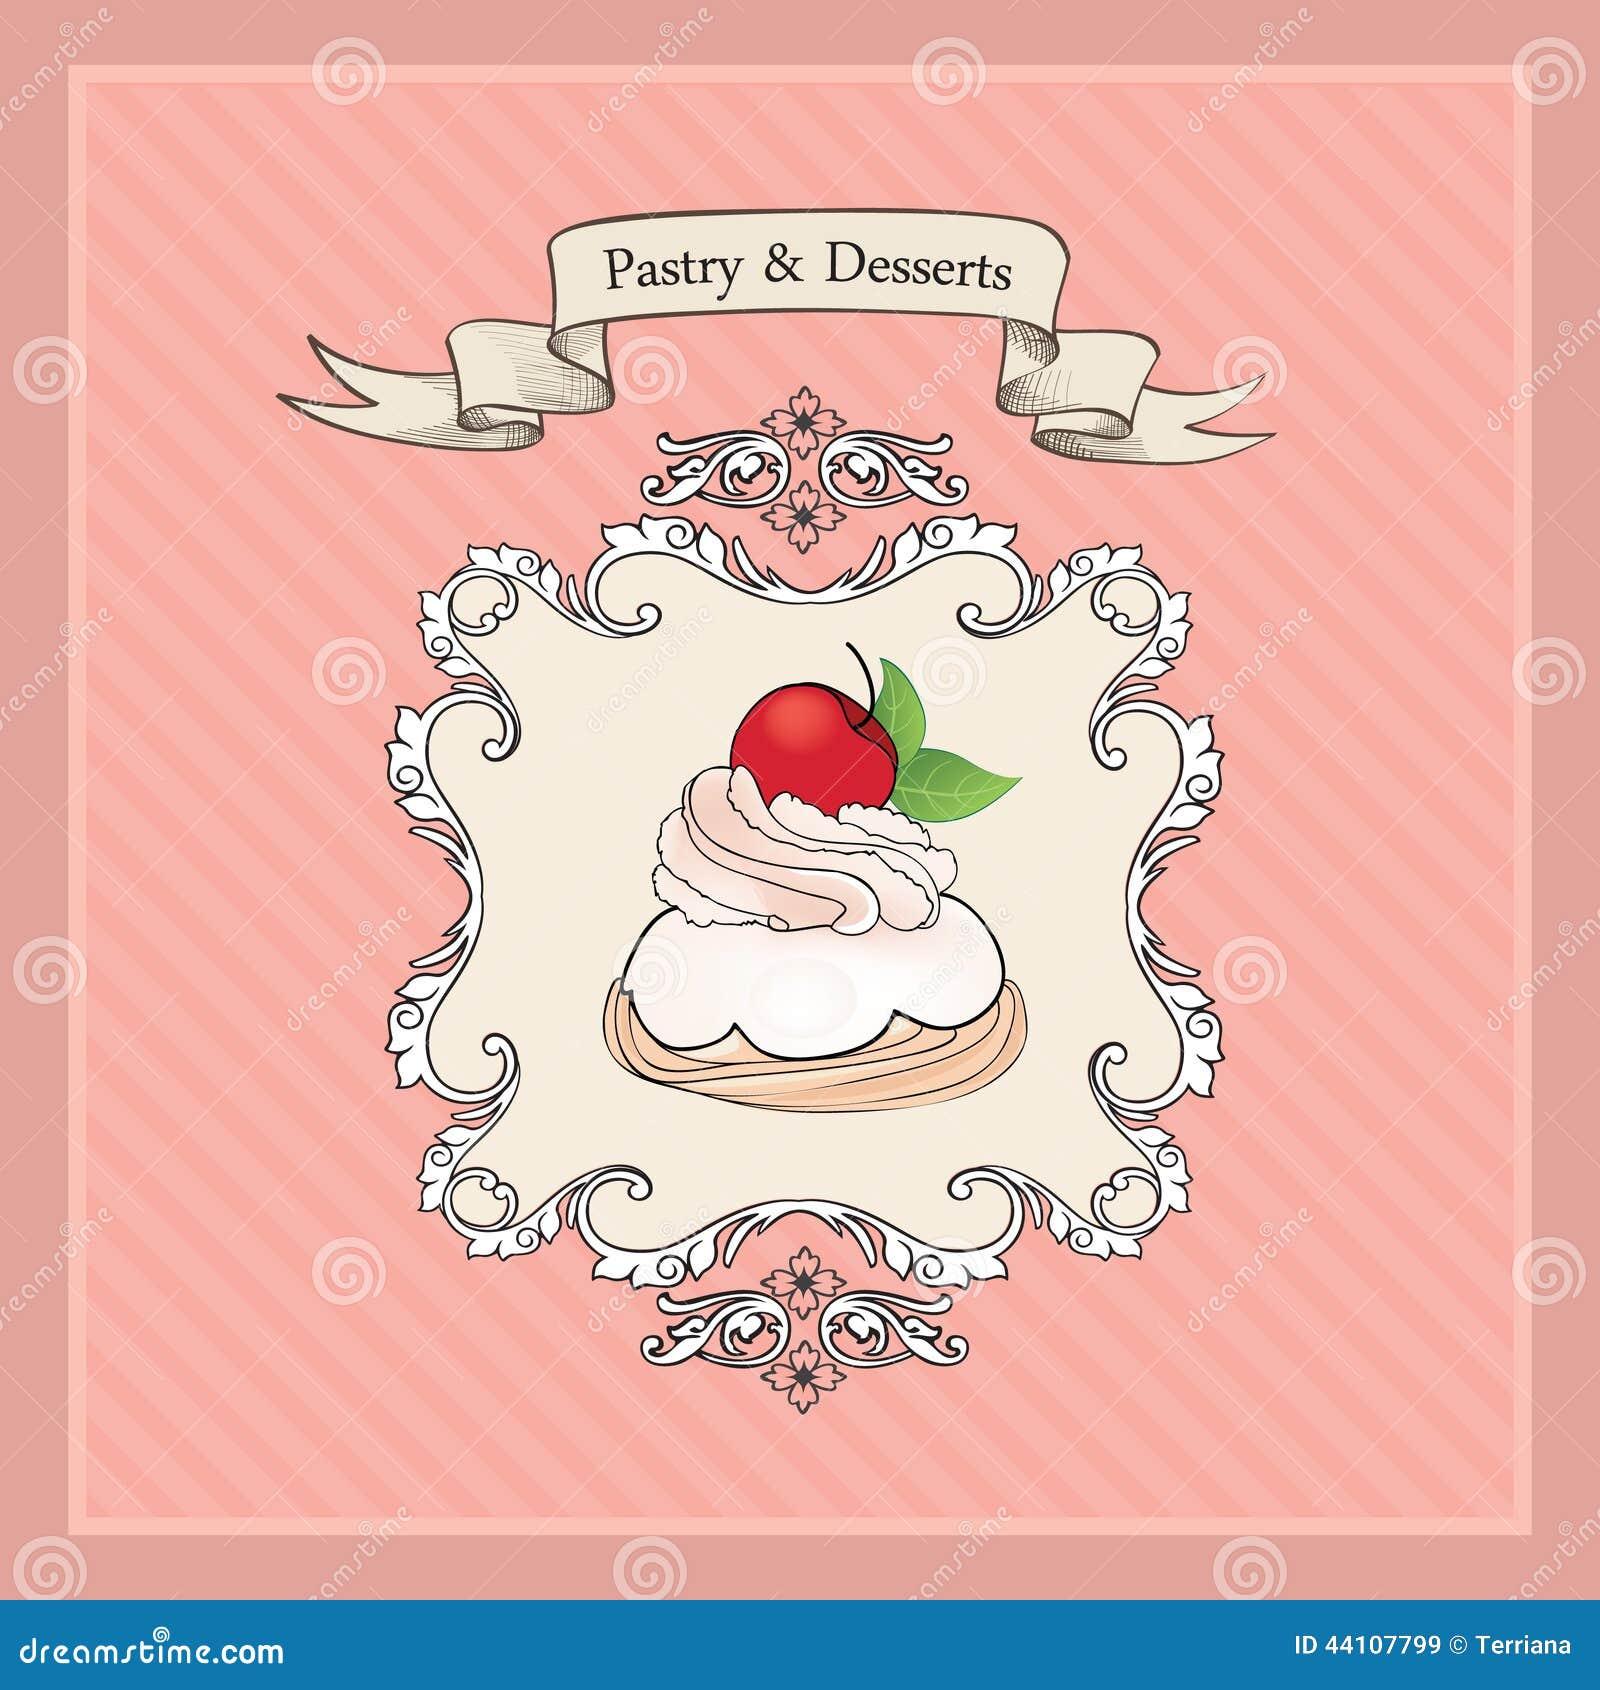 Sweet Dreams Cakes Bakery